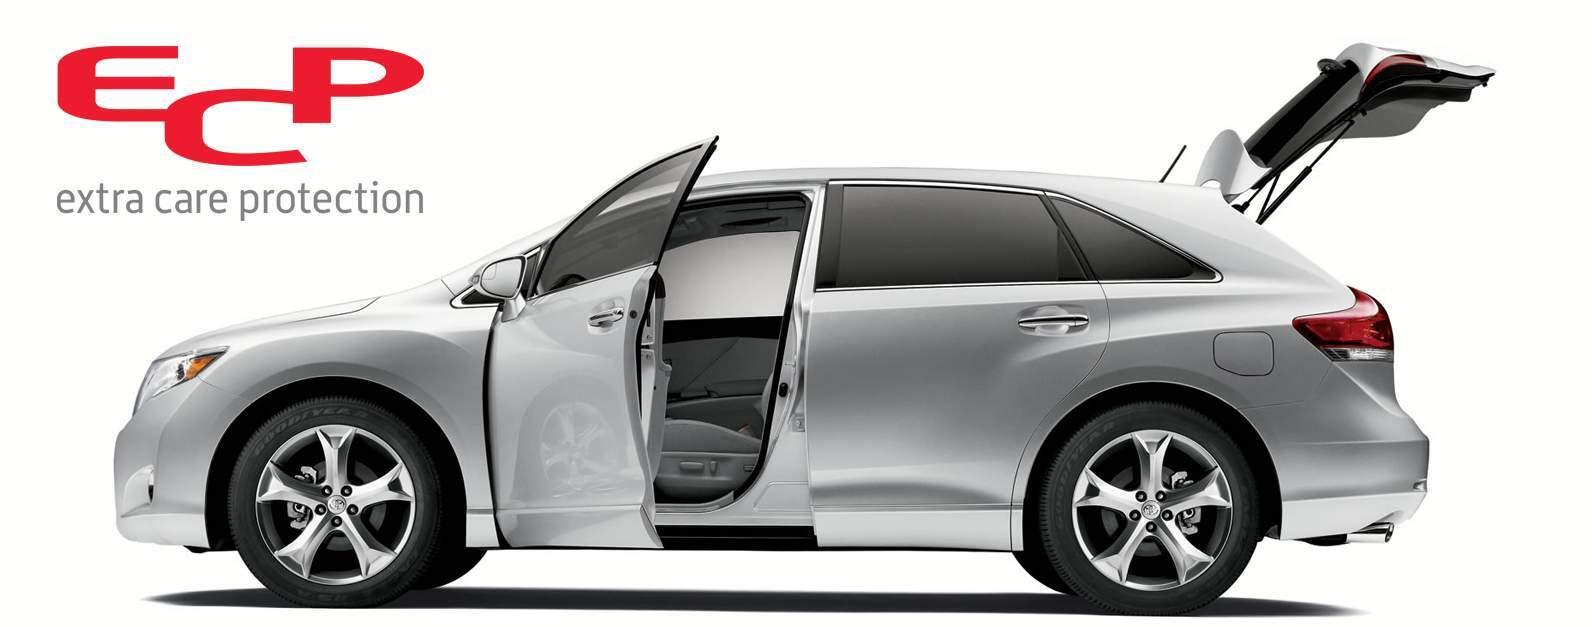 Ecp Car Protection Reviews